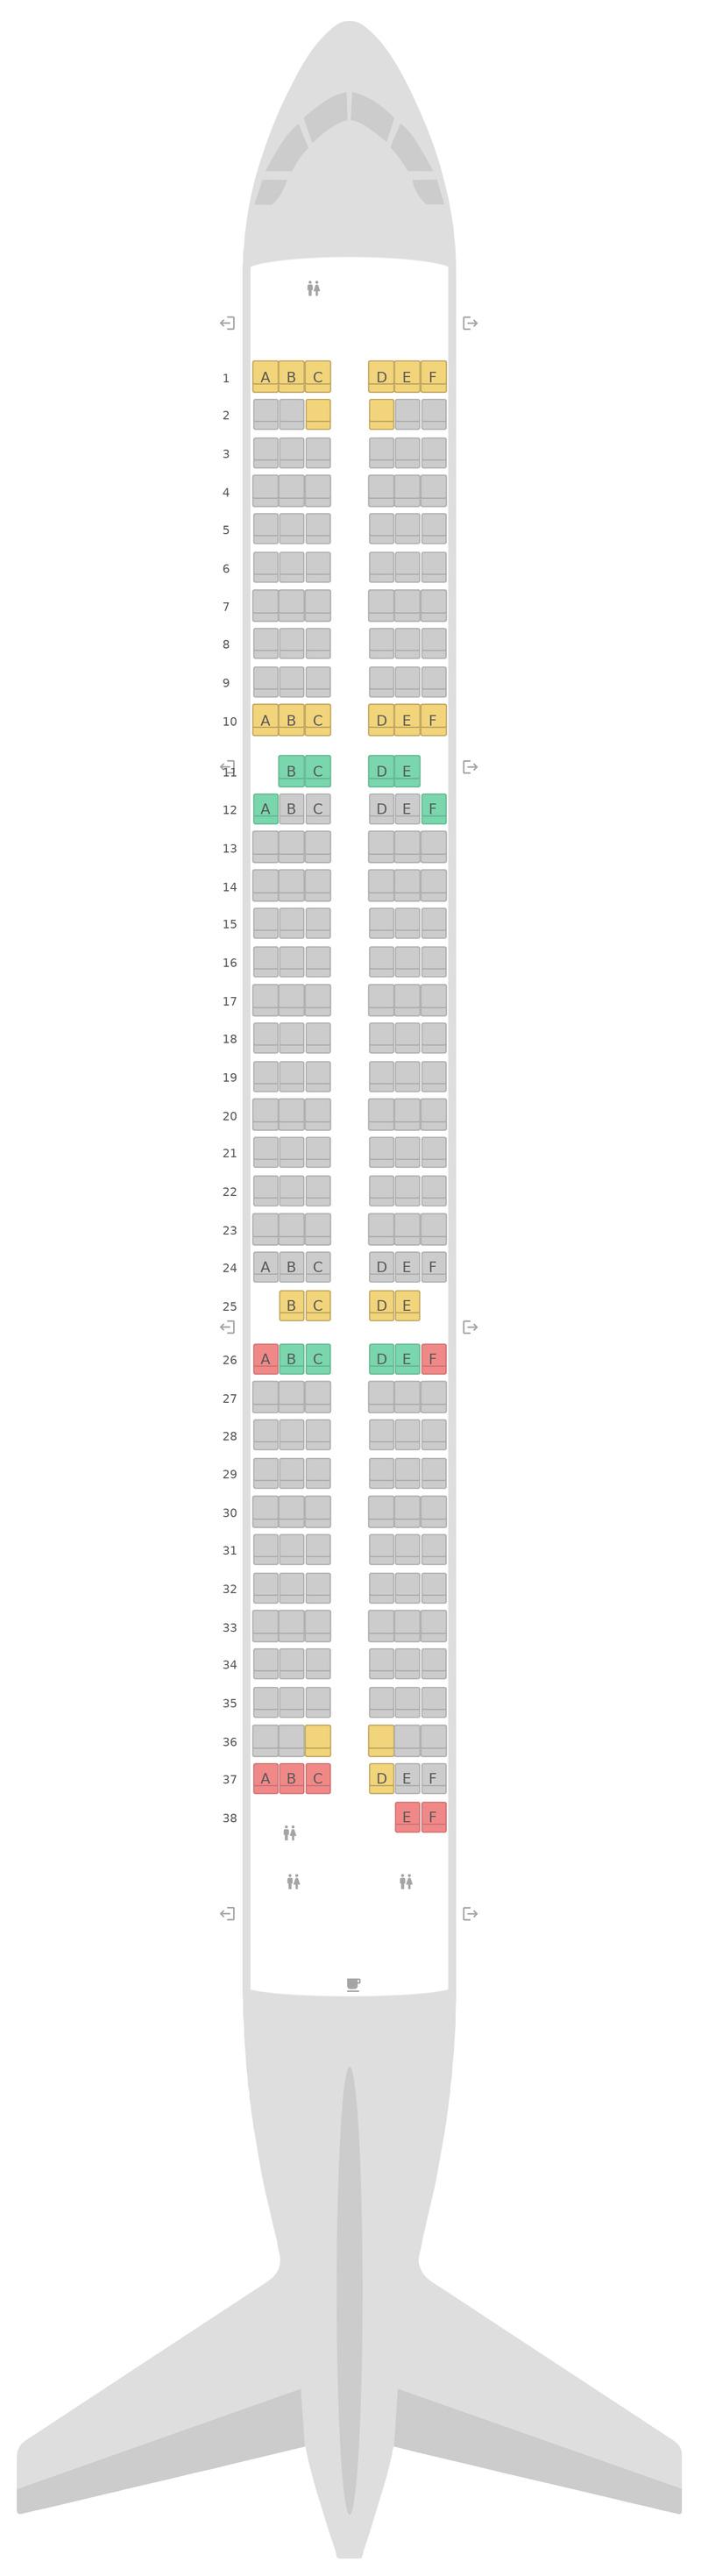 Sitzplan Airbus A321 v2 Jet2.com